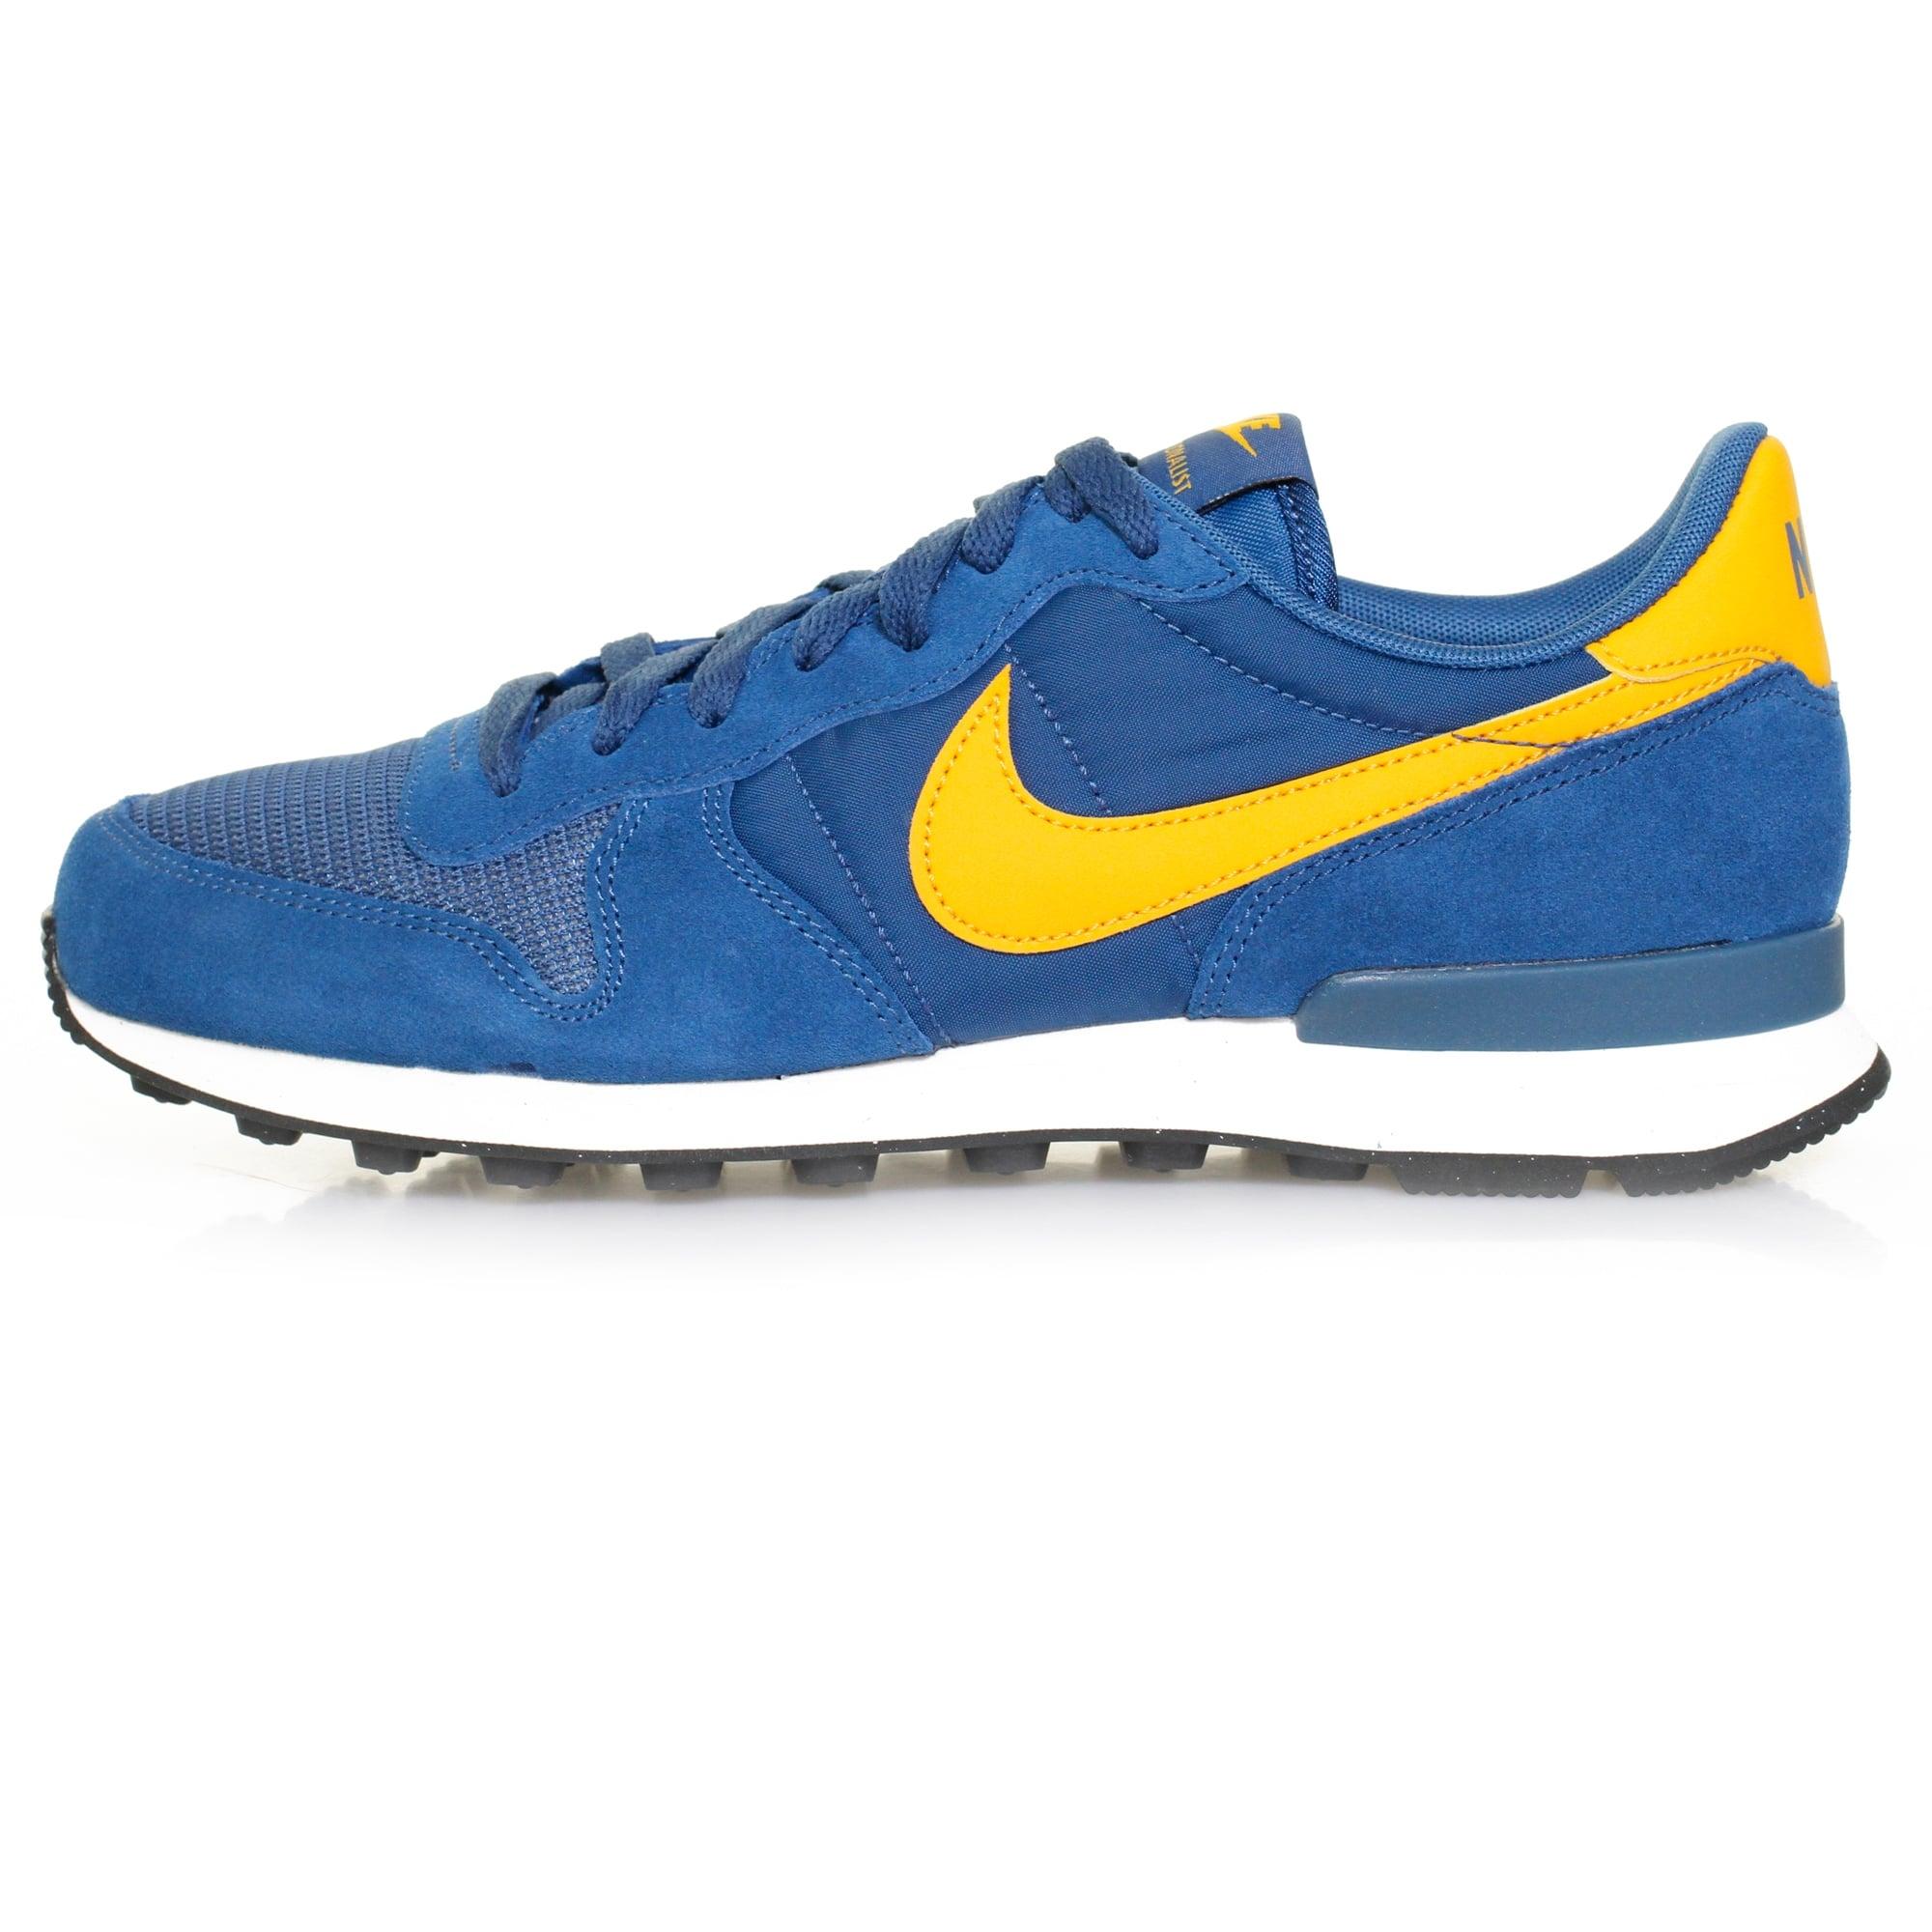 outlet store 52ca6 e0ea6 ... Nike Internationalist Court Blue Shoe 828041 402 ...